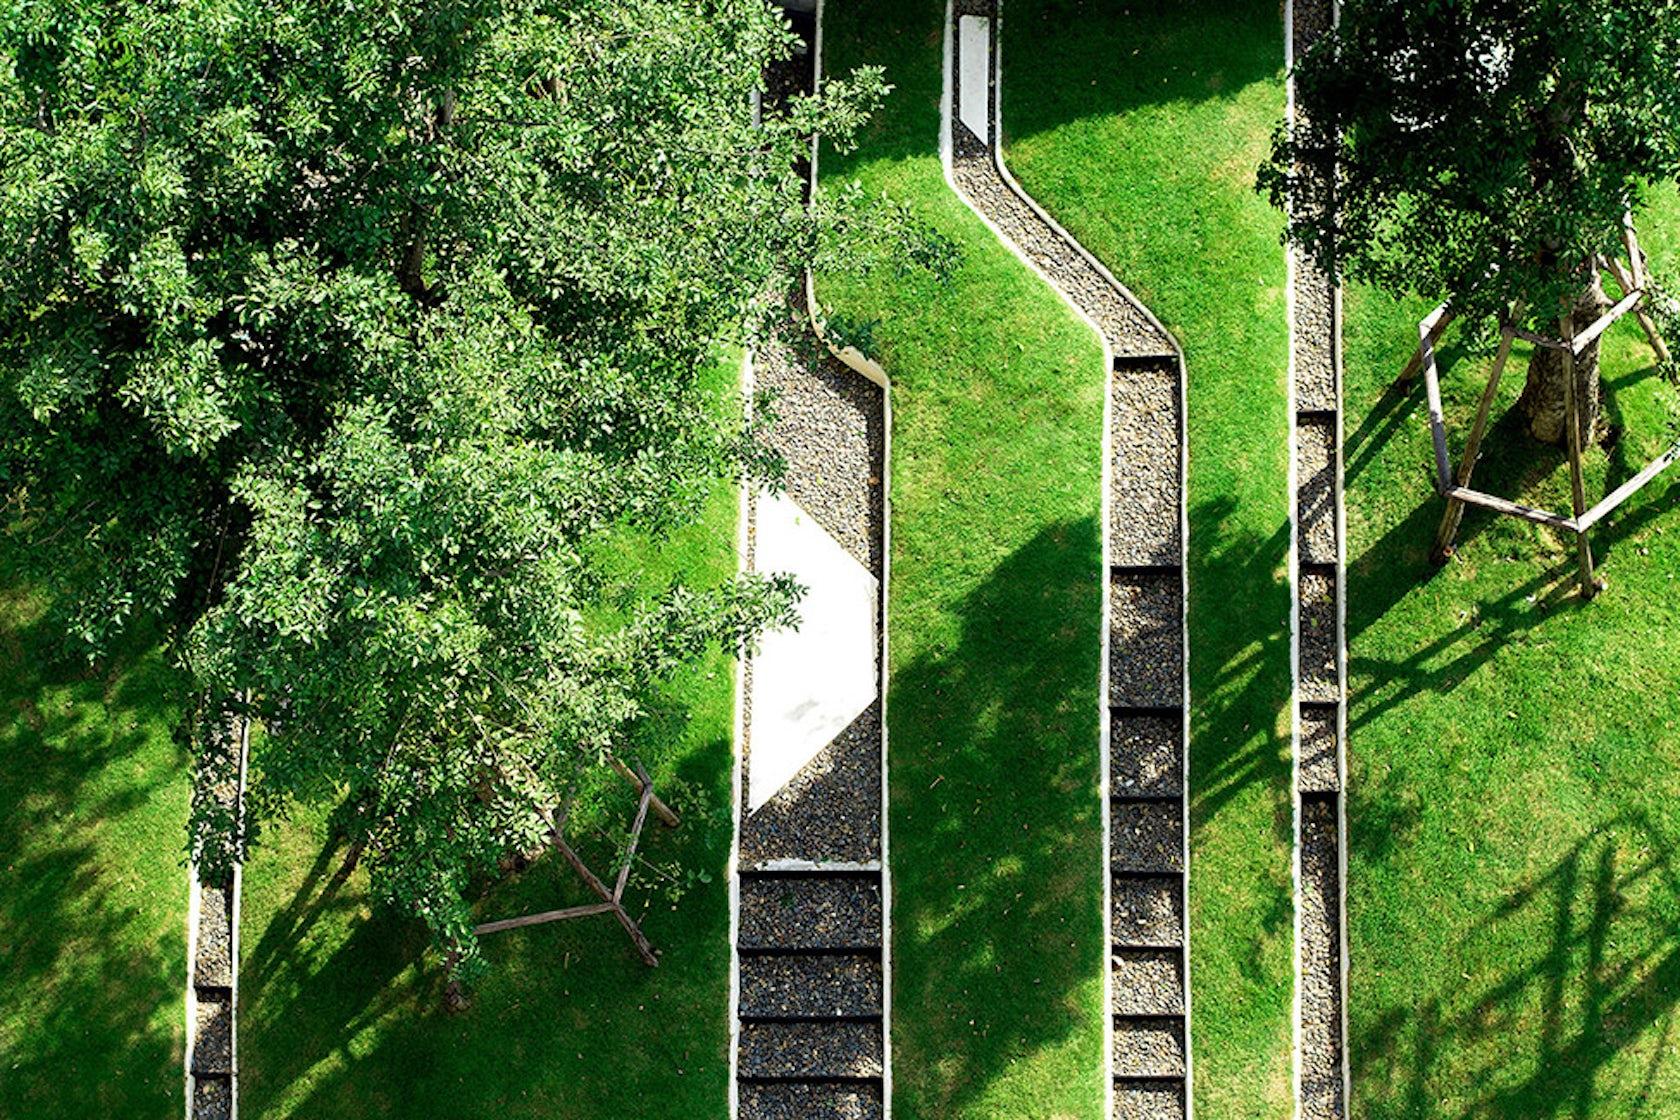 Trop terrains open space architizer for Outer space design landscape architects